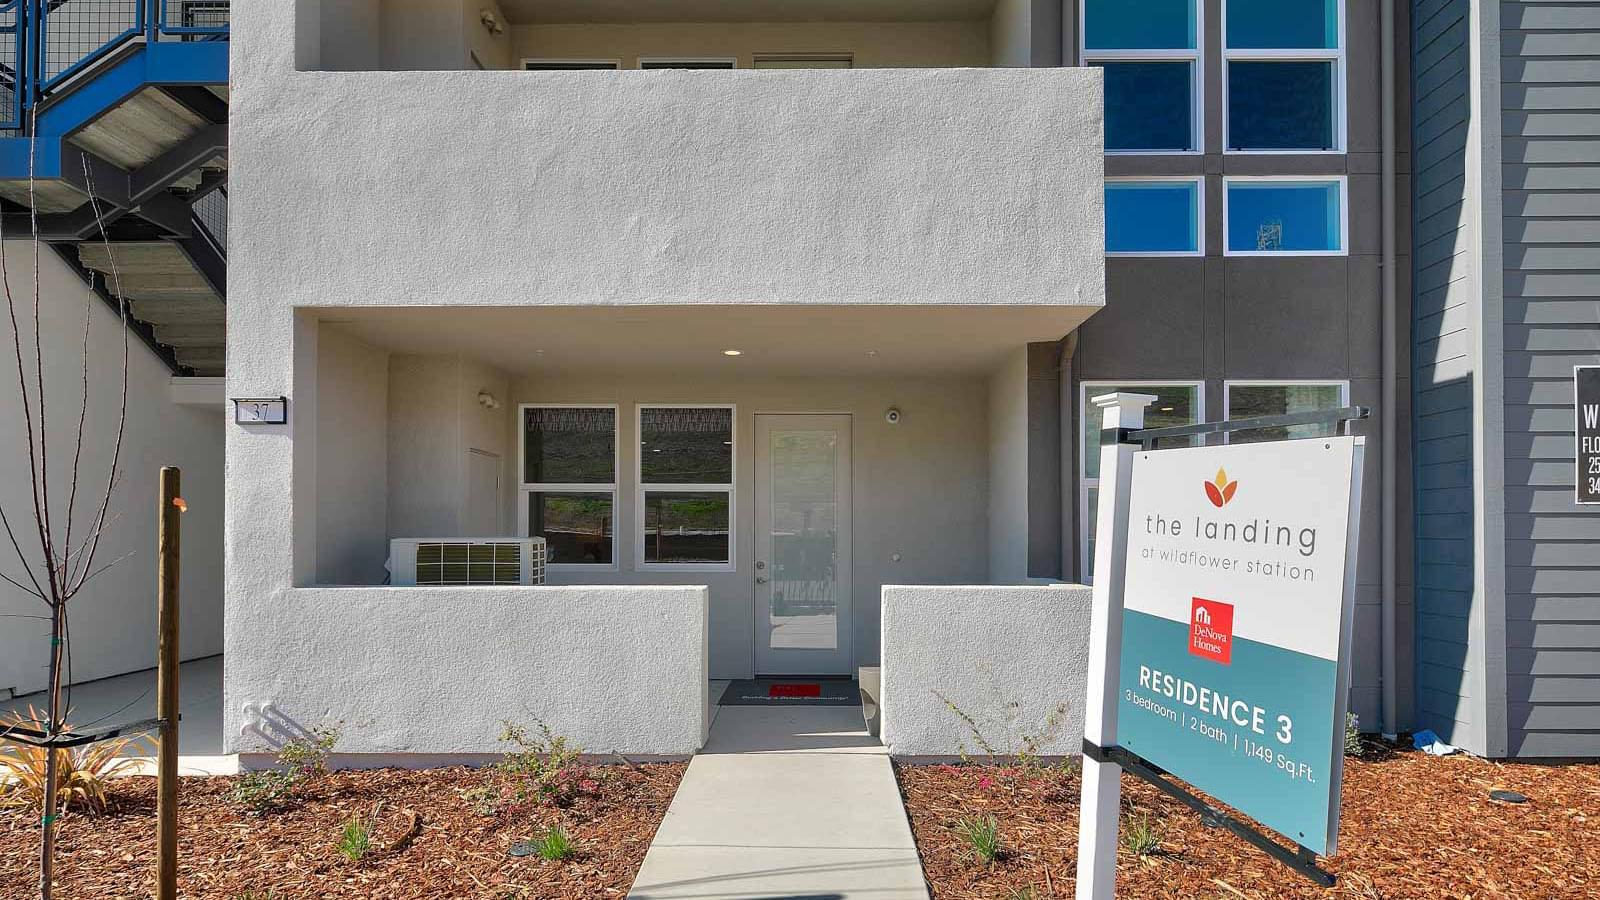 Residence 3 Entry Ground Level